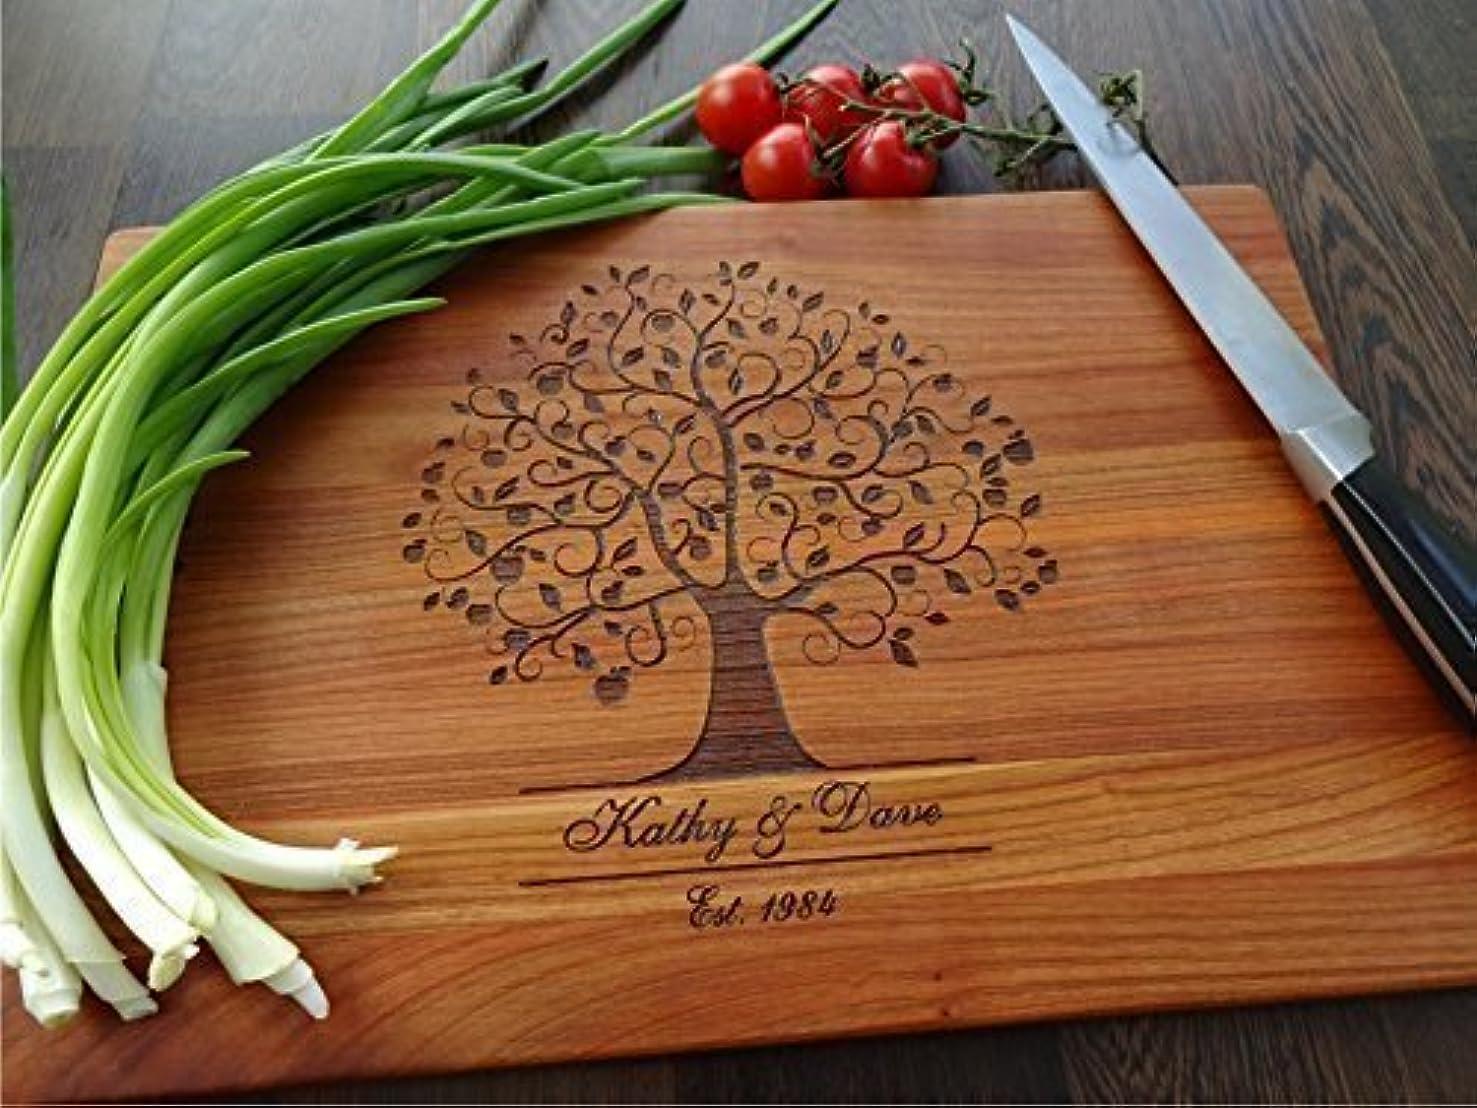 FAMILY TREE handmade cutting board. Wedding gift. Laser engraved cutting board. Birthday gift